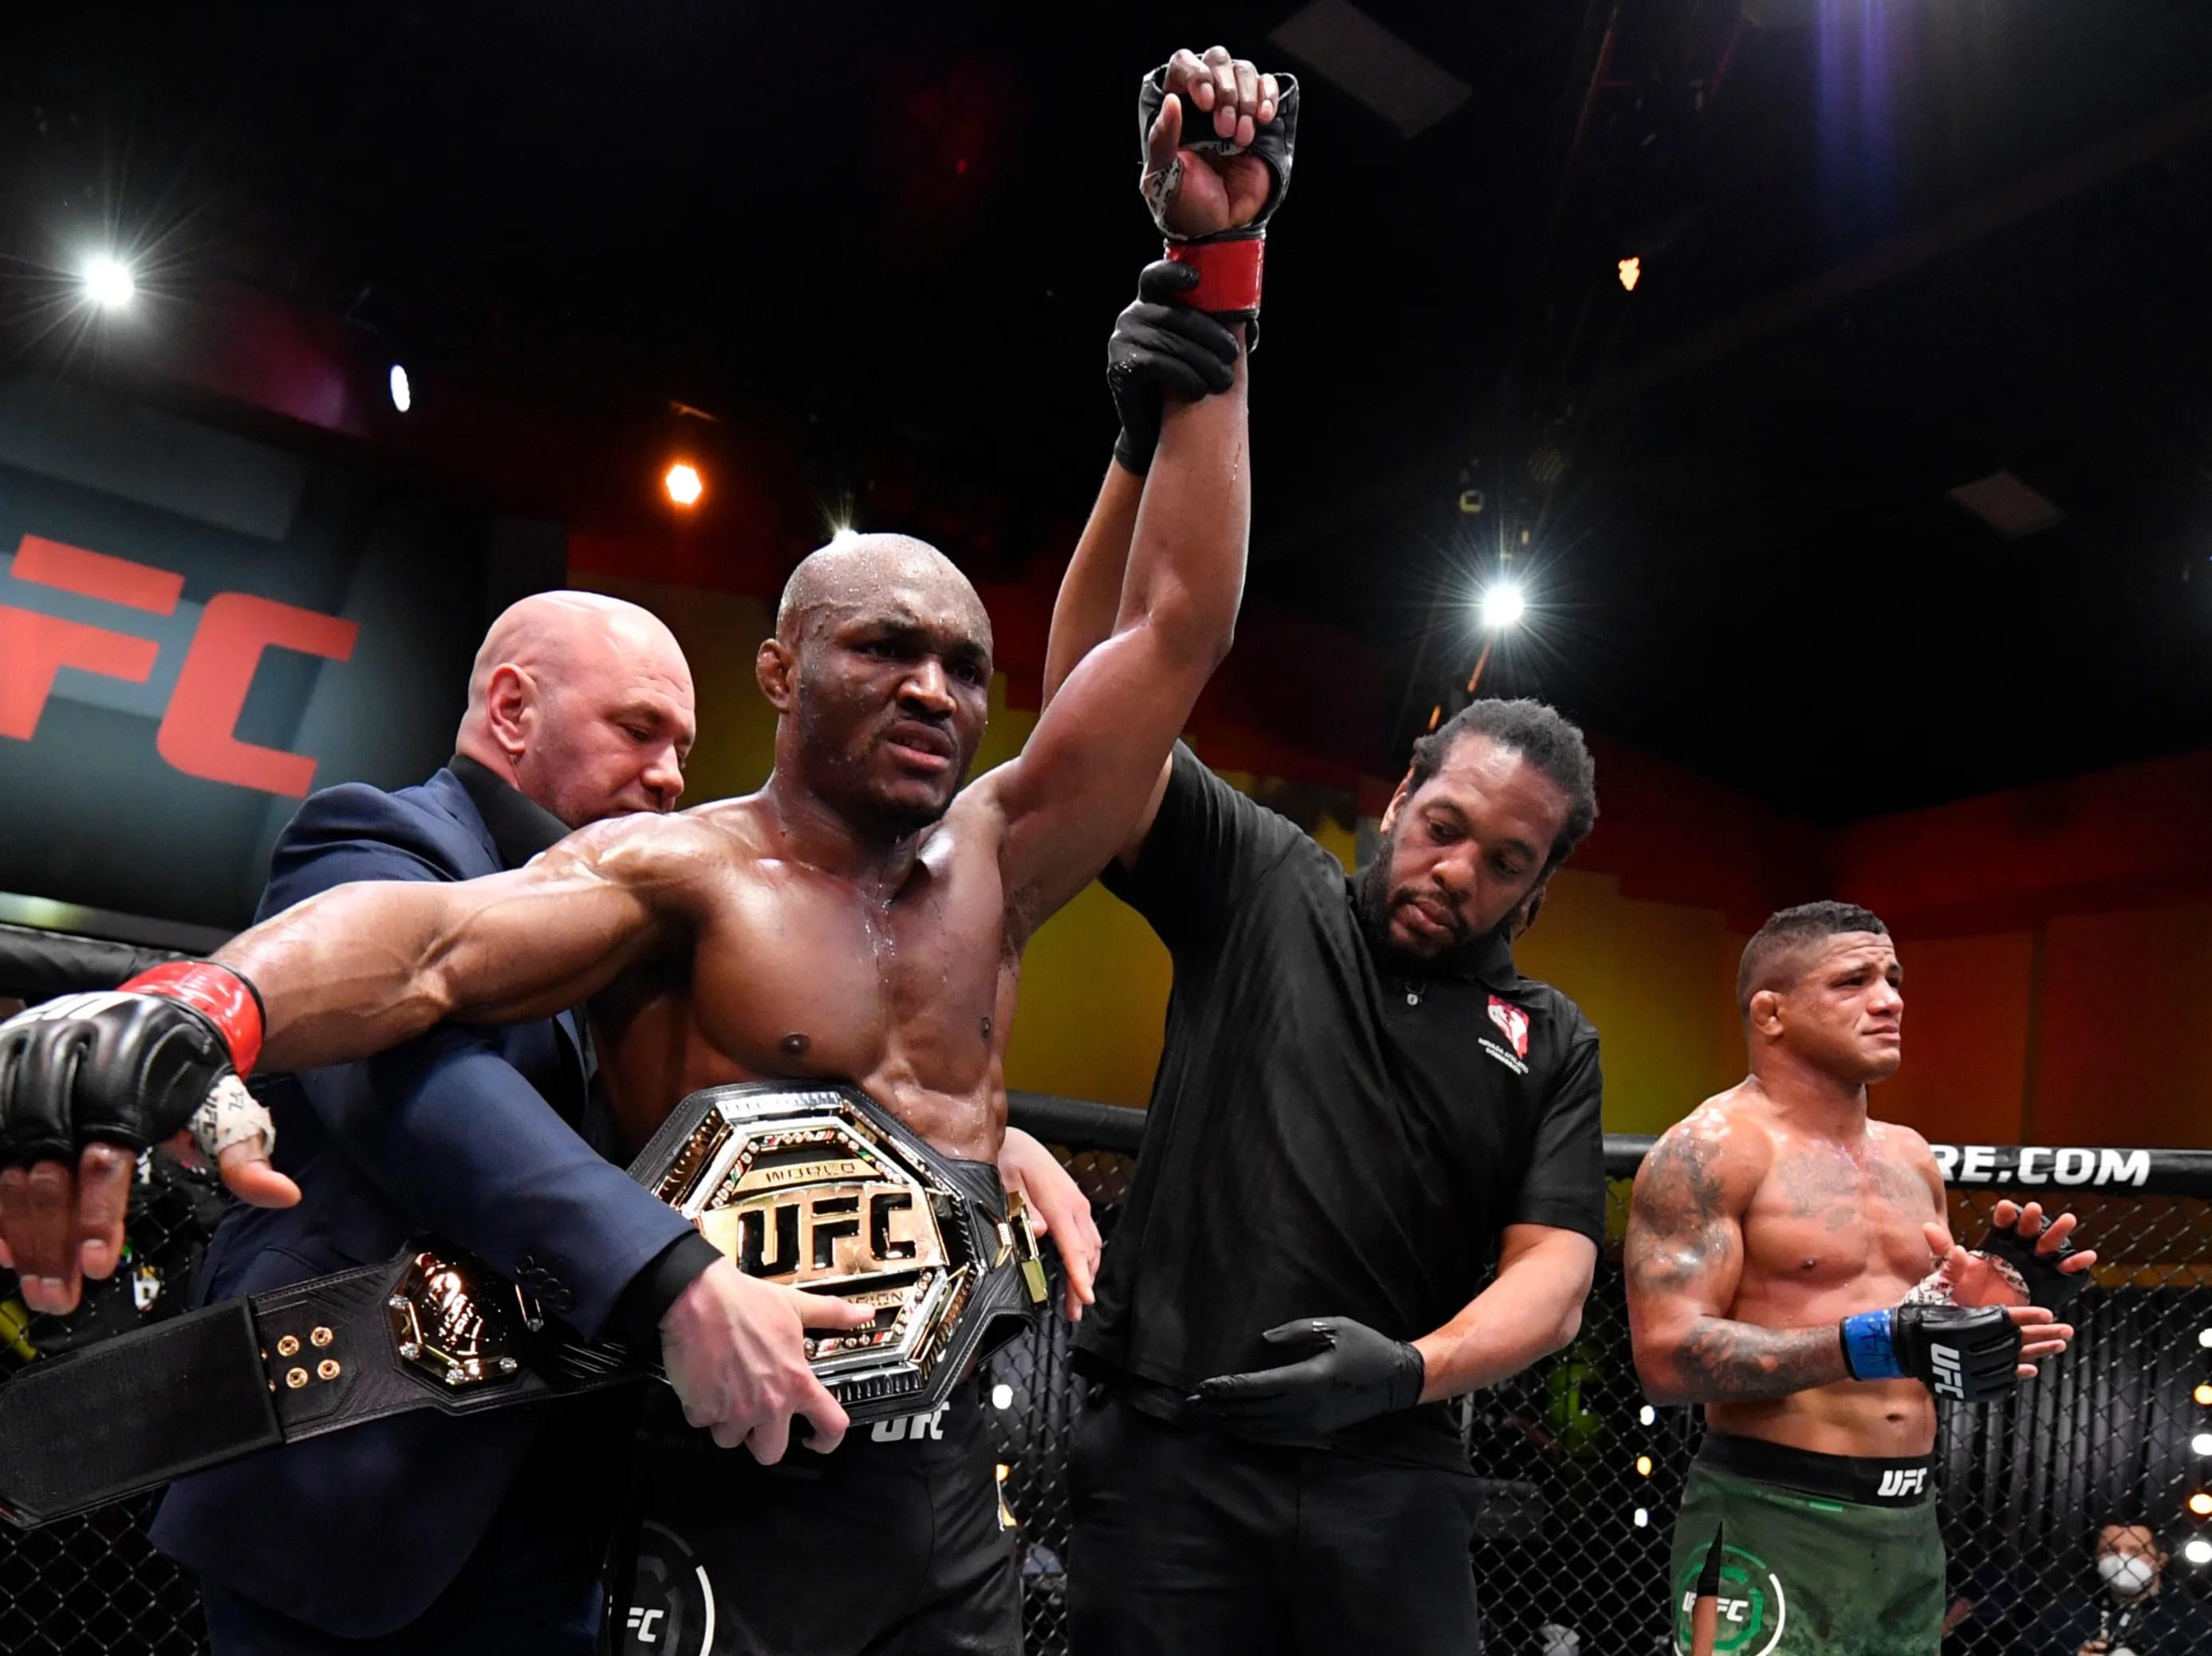 UFC 258 results: Kamaru Usman stops former team-mate Gilbert Burns to  retain welterweight title   The Independent